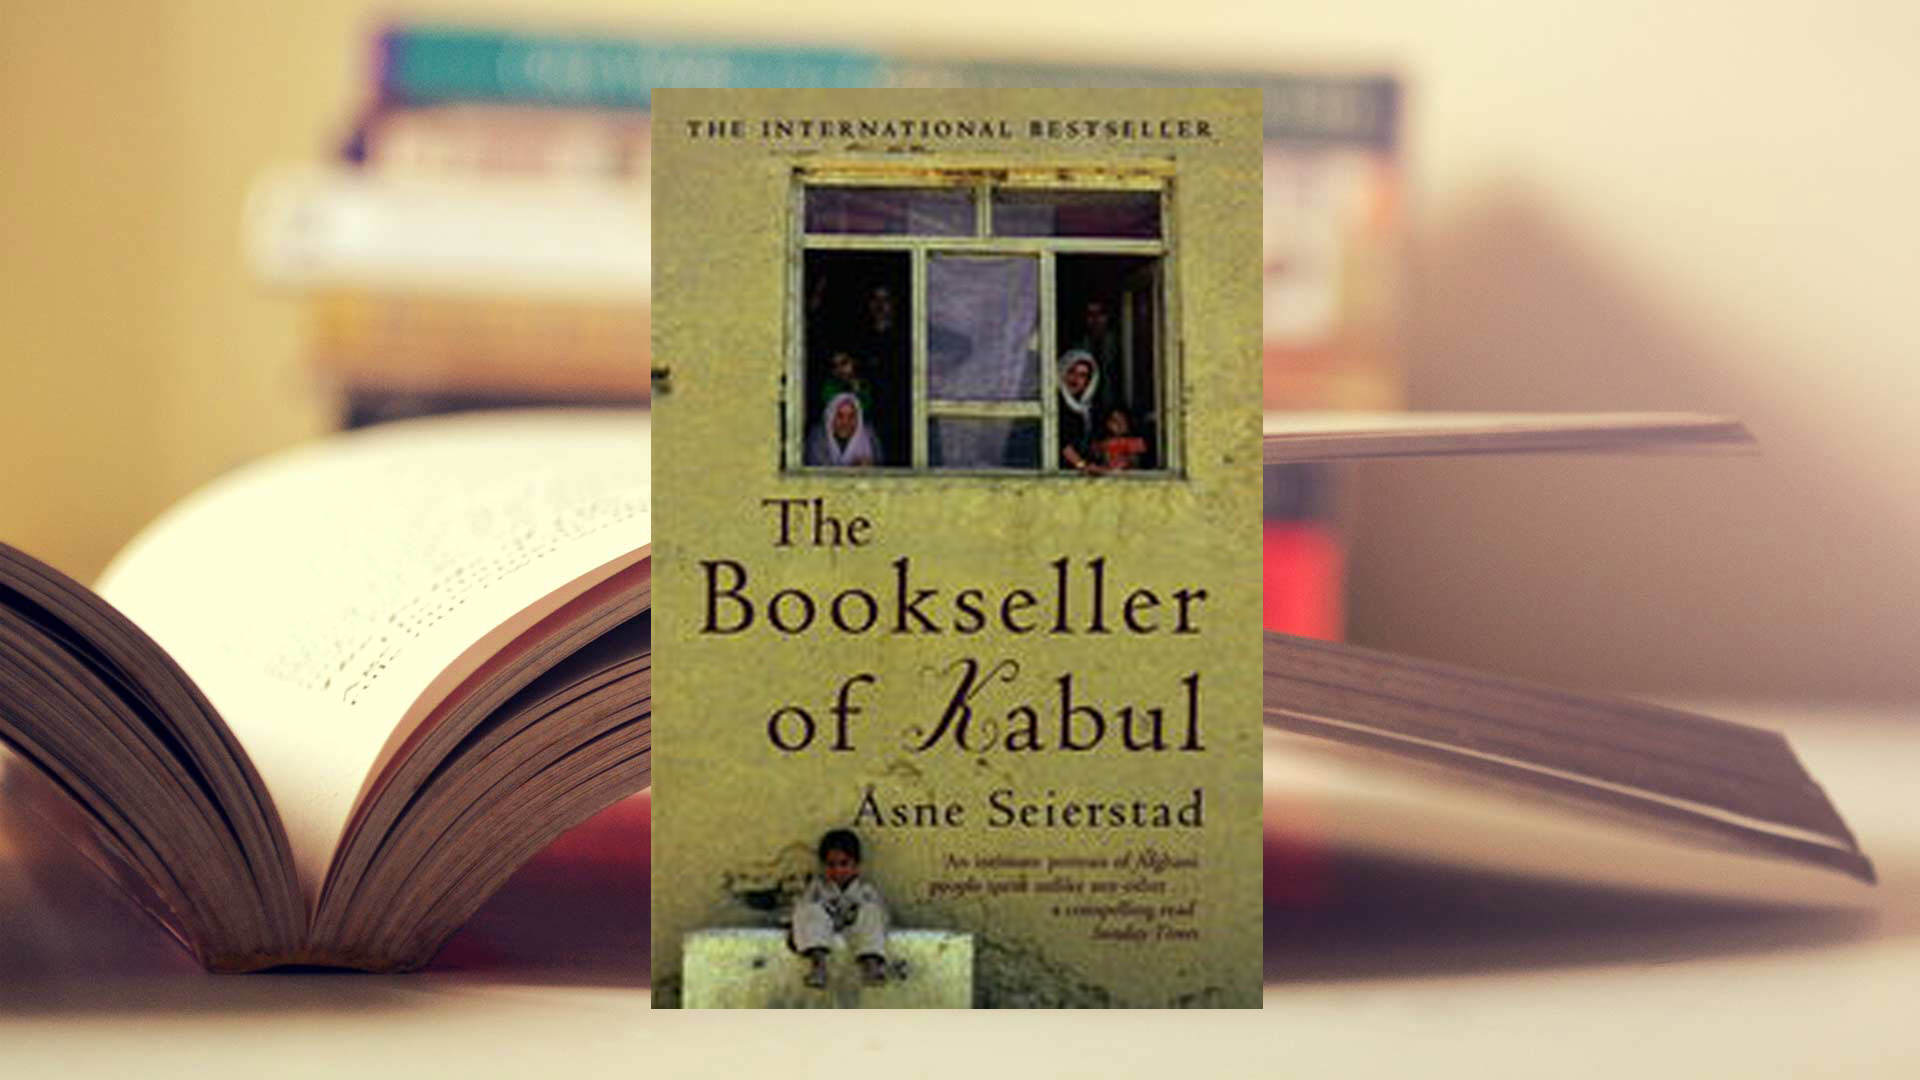 The Bookseller of Kabul by Åsne Seierstad, translated by Ingrid Christophersen